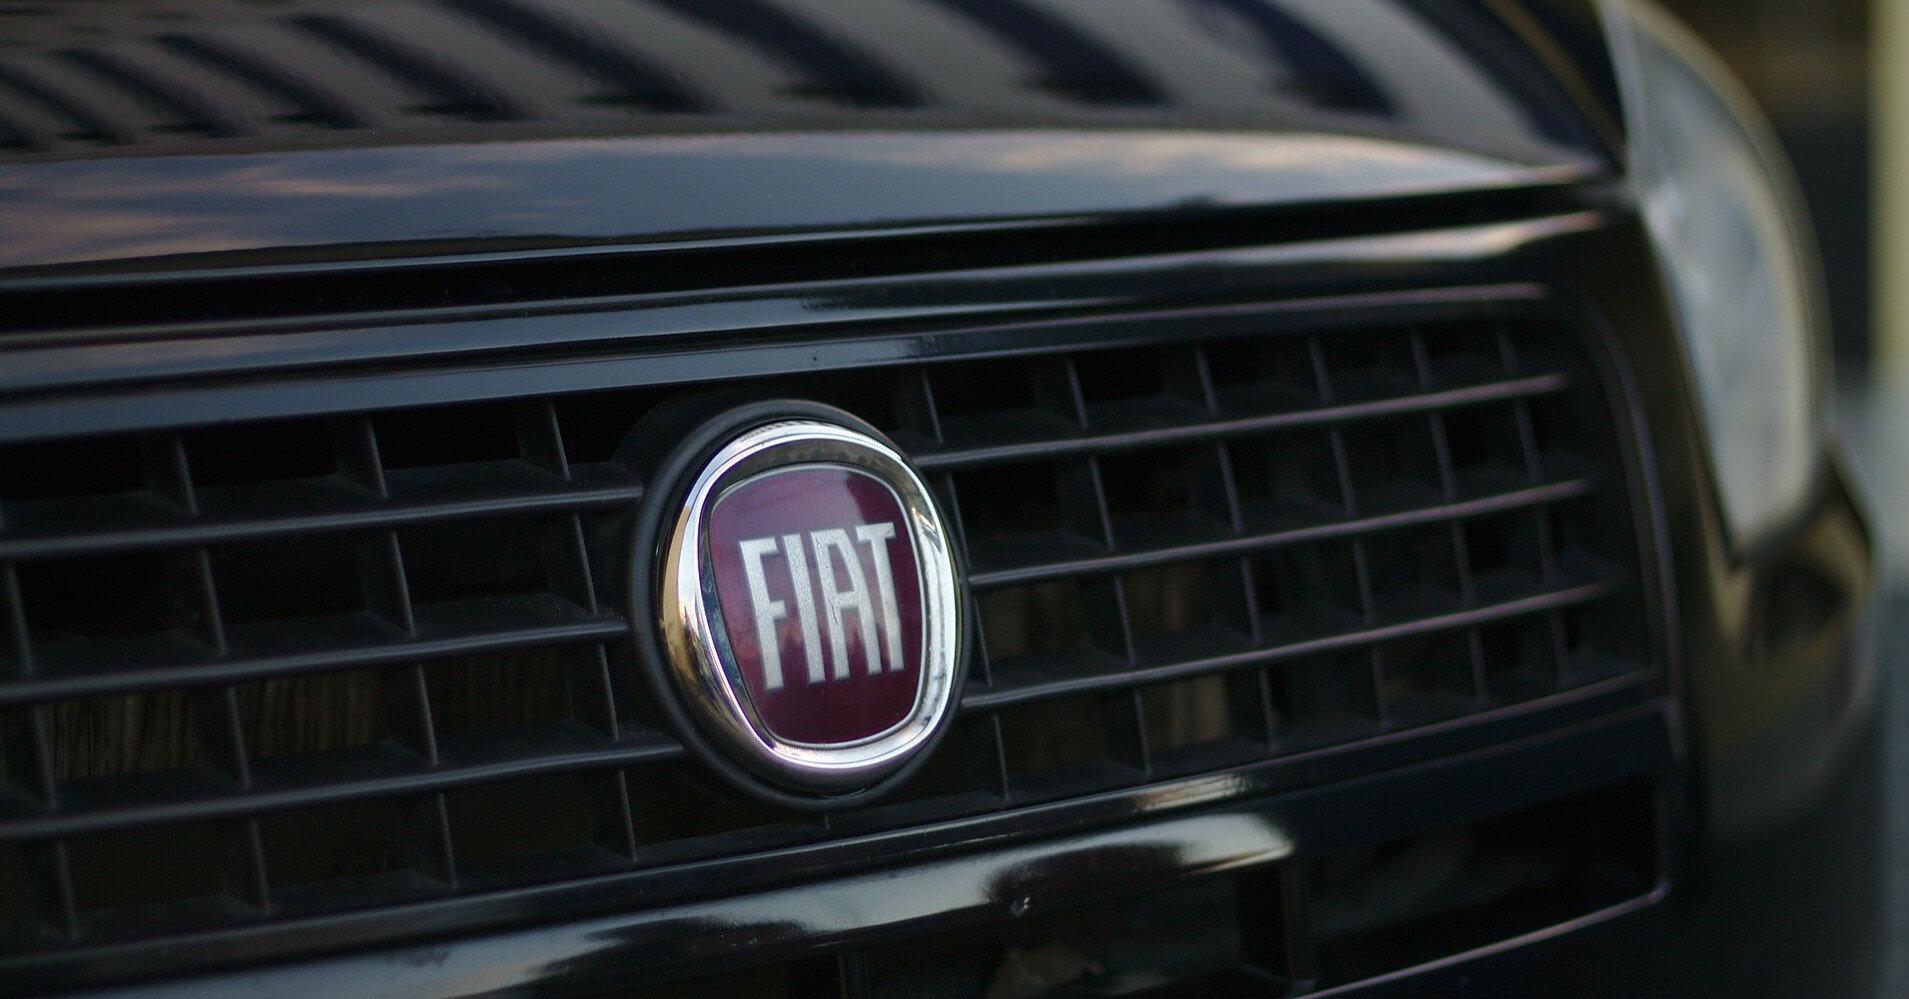 Fiat станет электрическим брендом